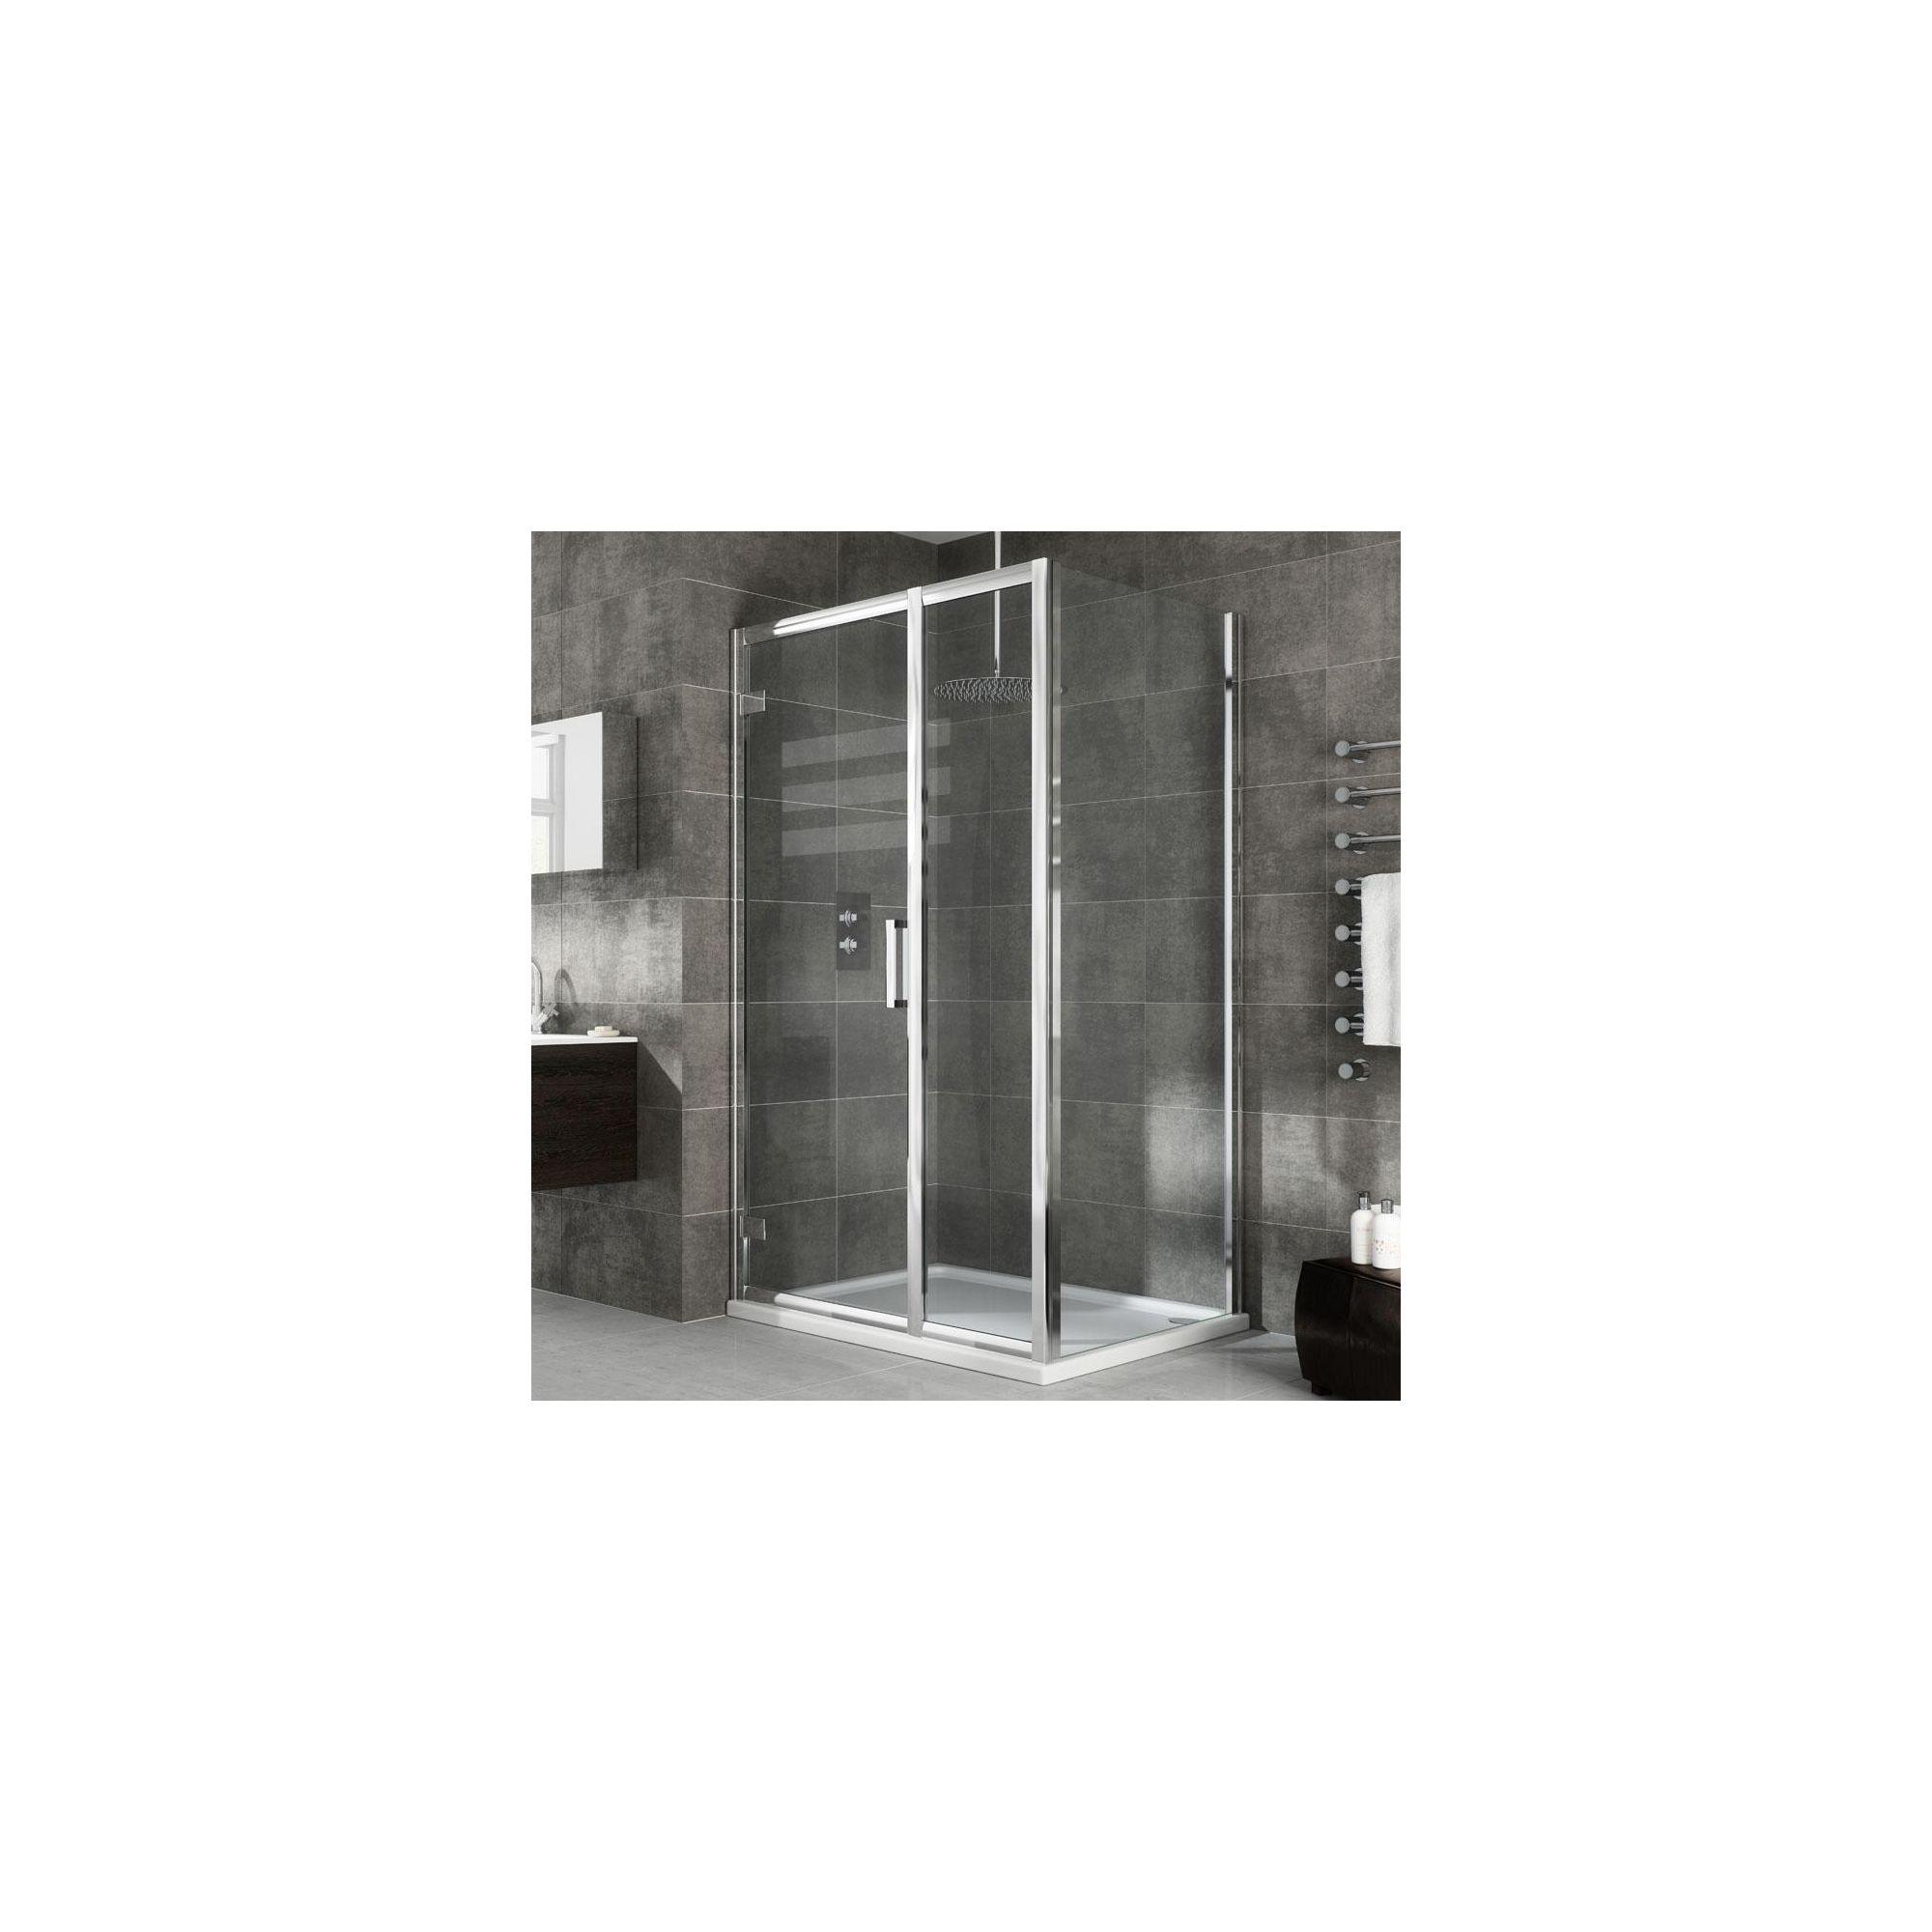 Elemis Eternity Inline Hinged Shower Door, 1400mm Wide, 8mm Glass at Tesco Direct